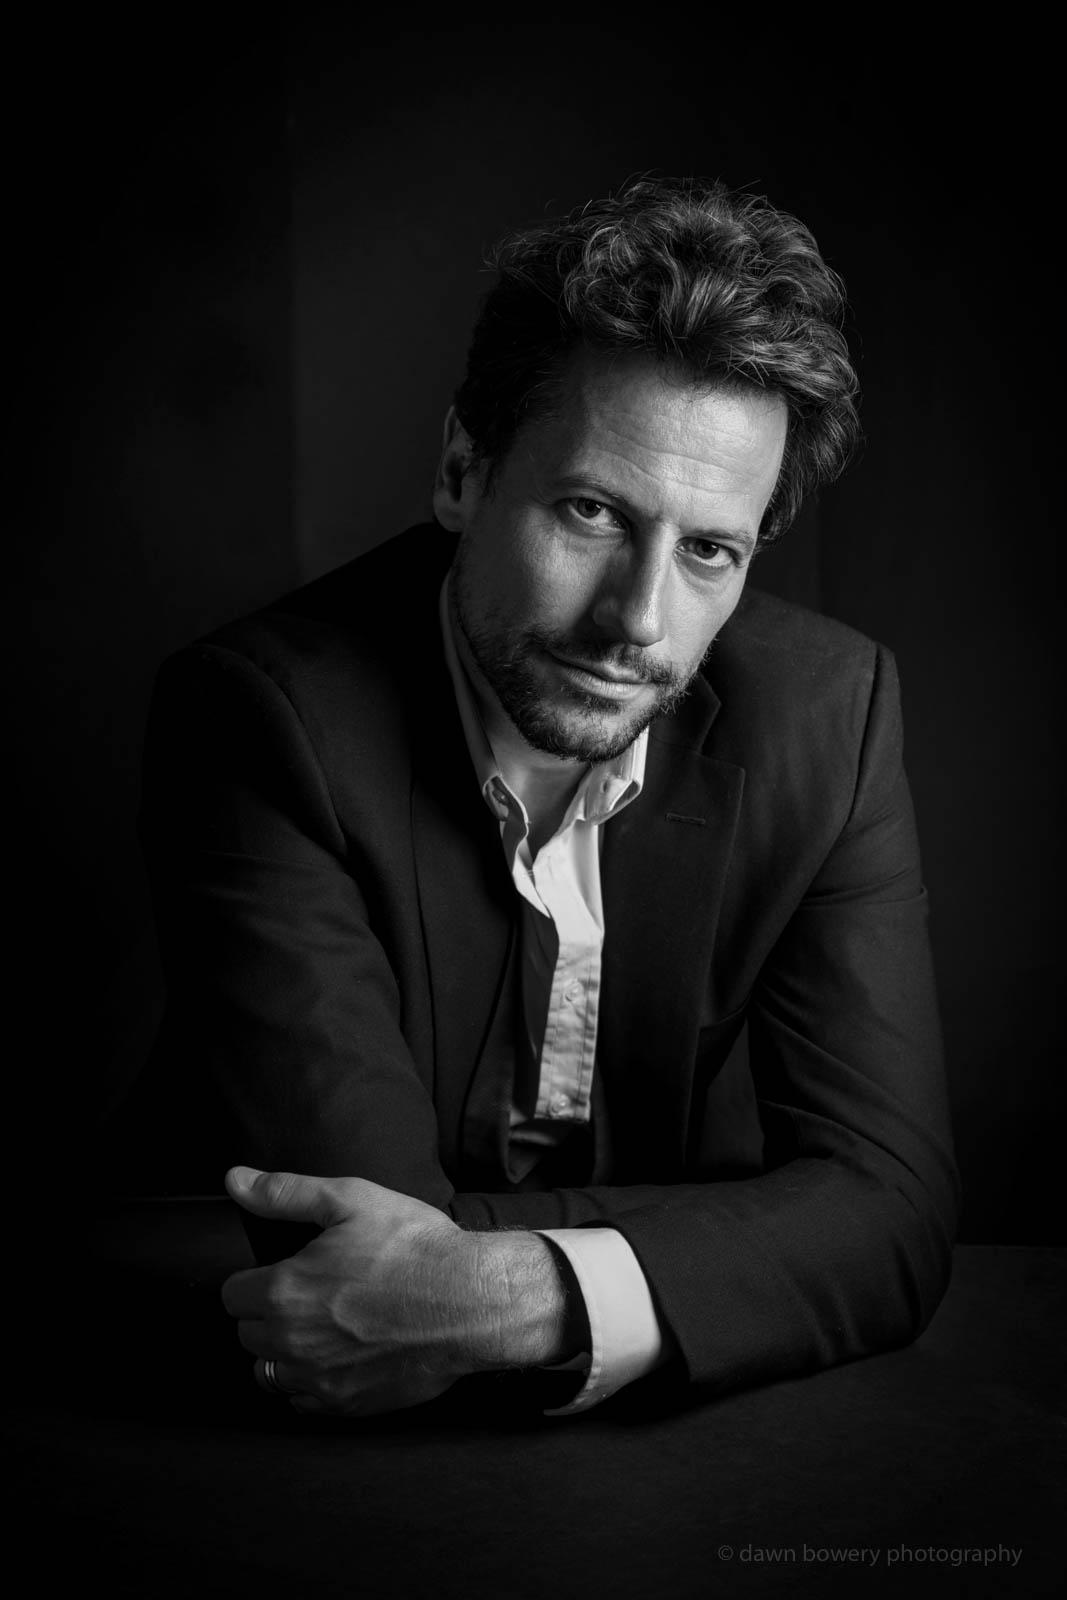 ioan gruffudd, movie star, welsh actor, los angeles celebrity photographer